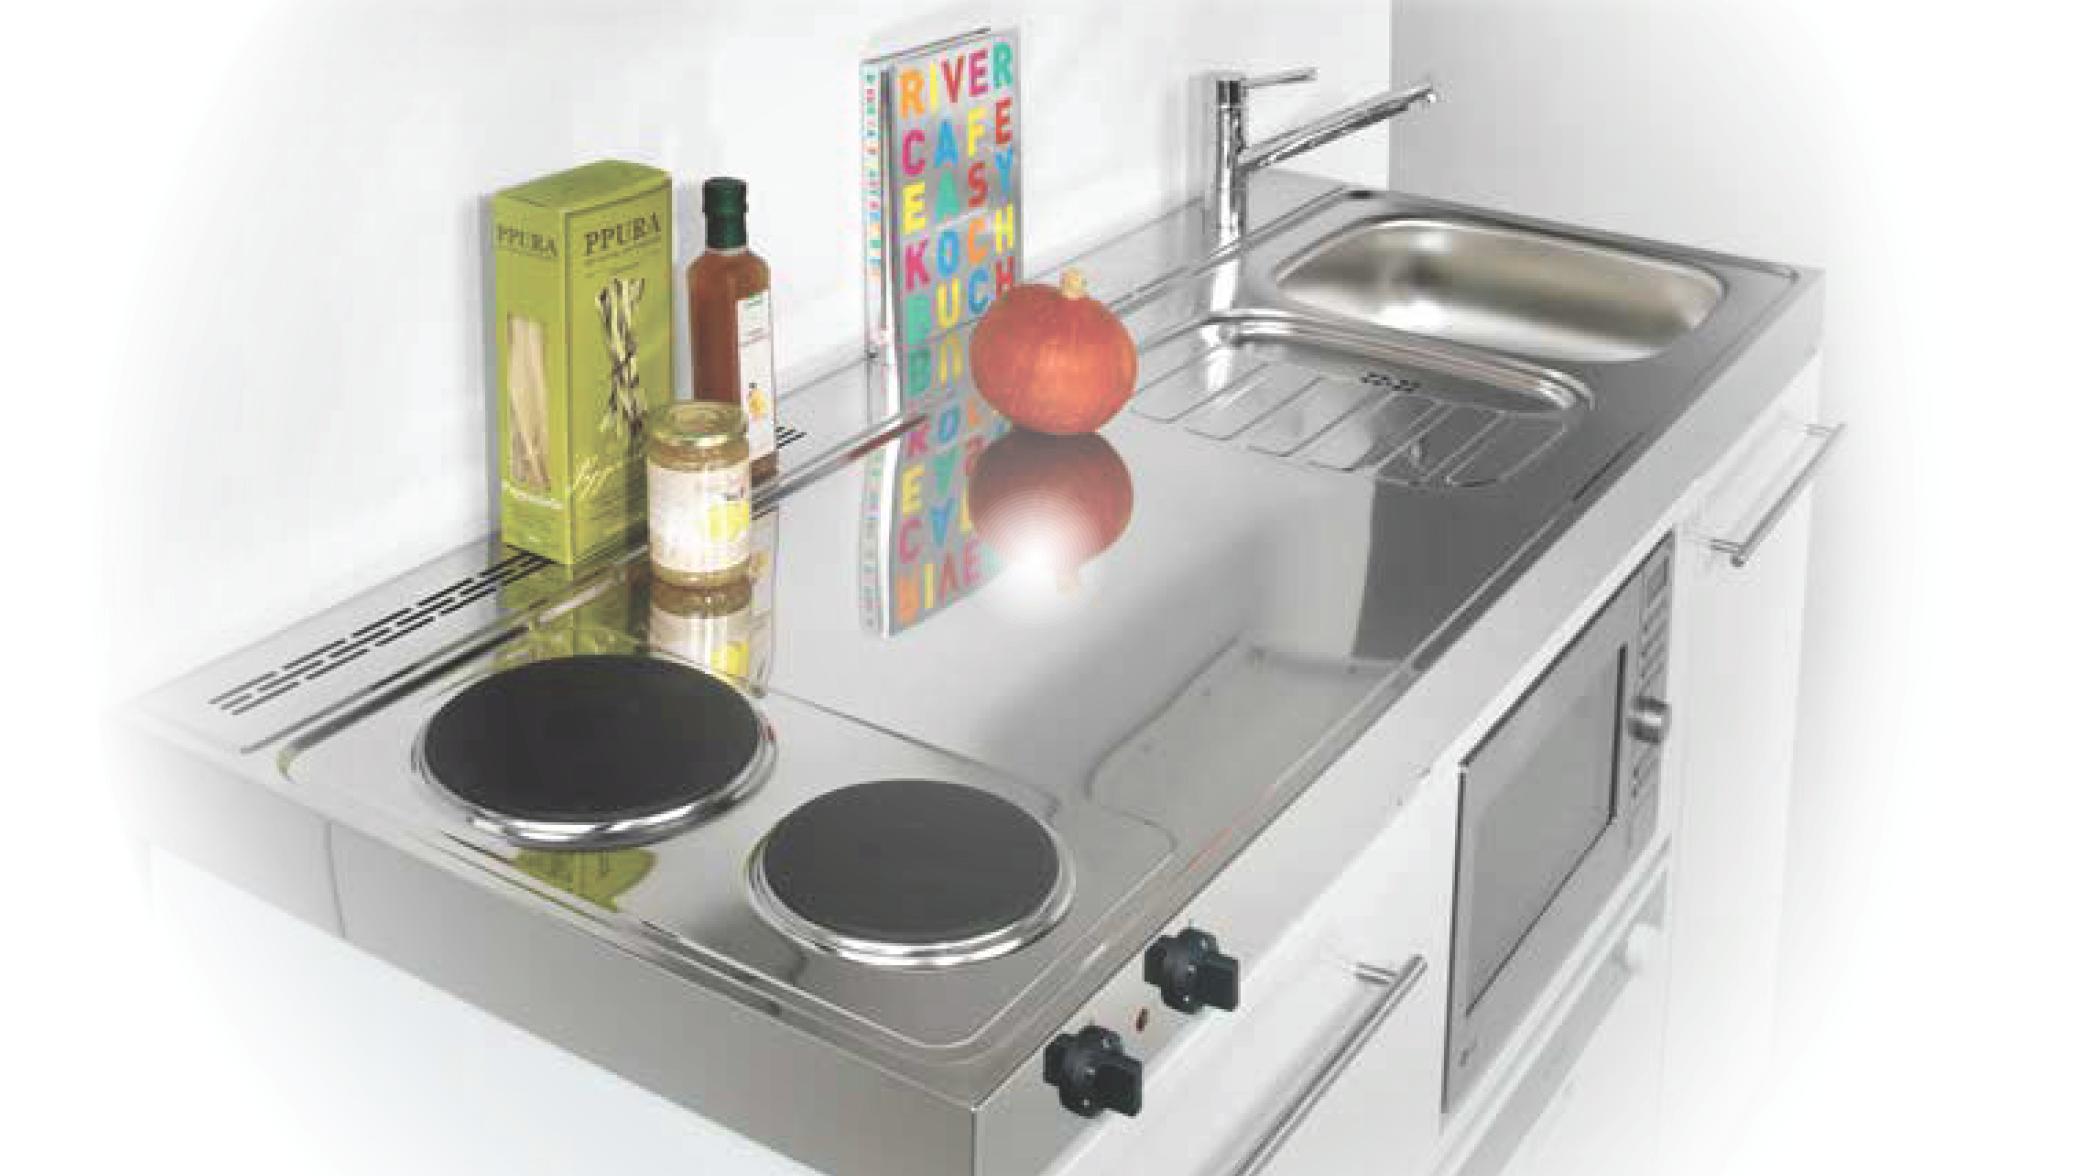 Mini Kitchens Micro Kitchens Business Home Gallery Kitchen Design